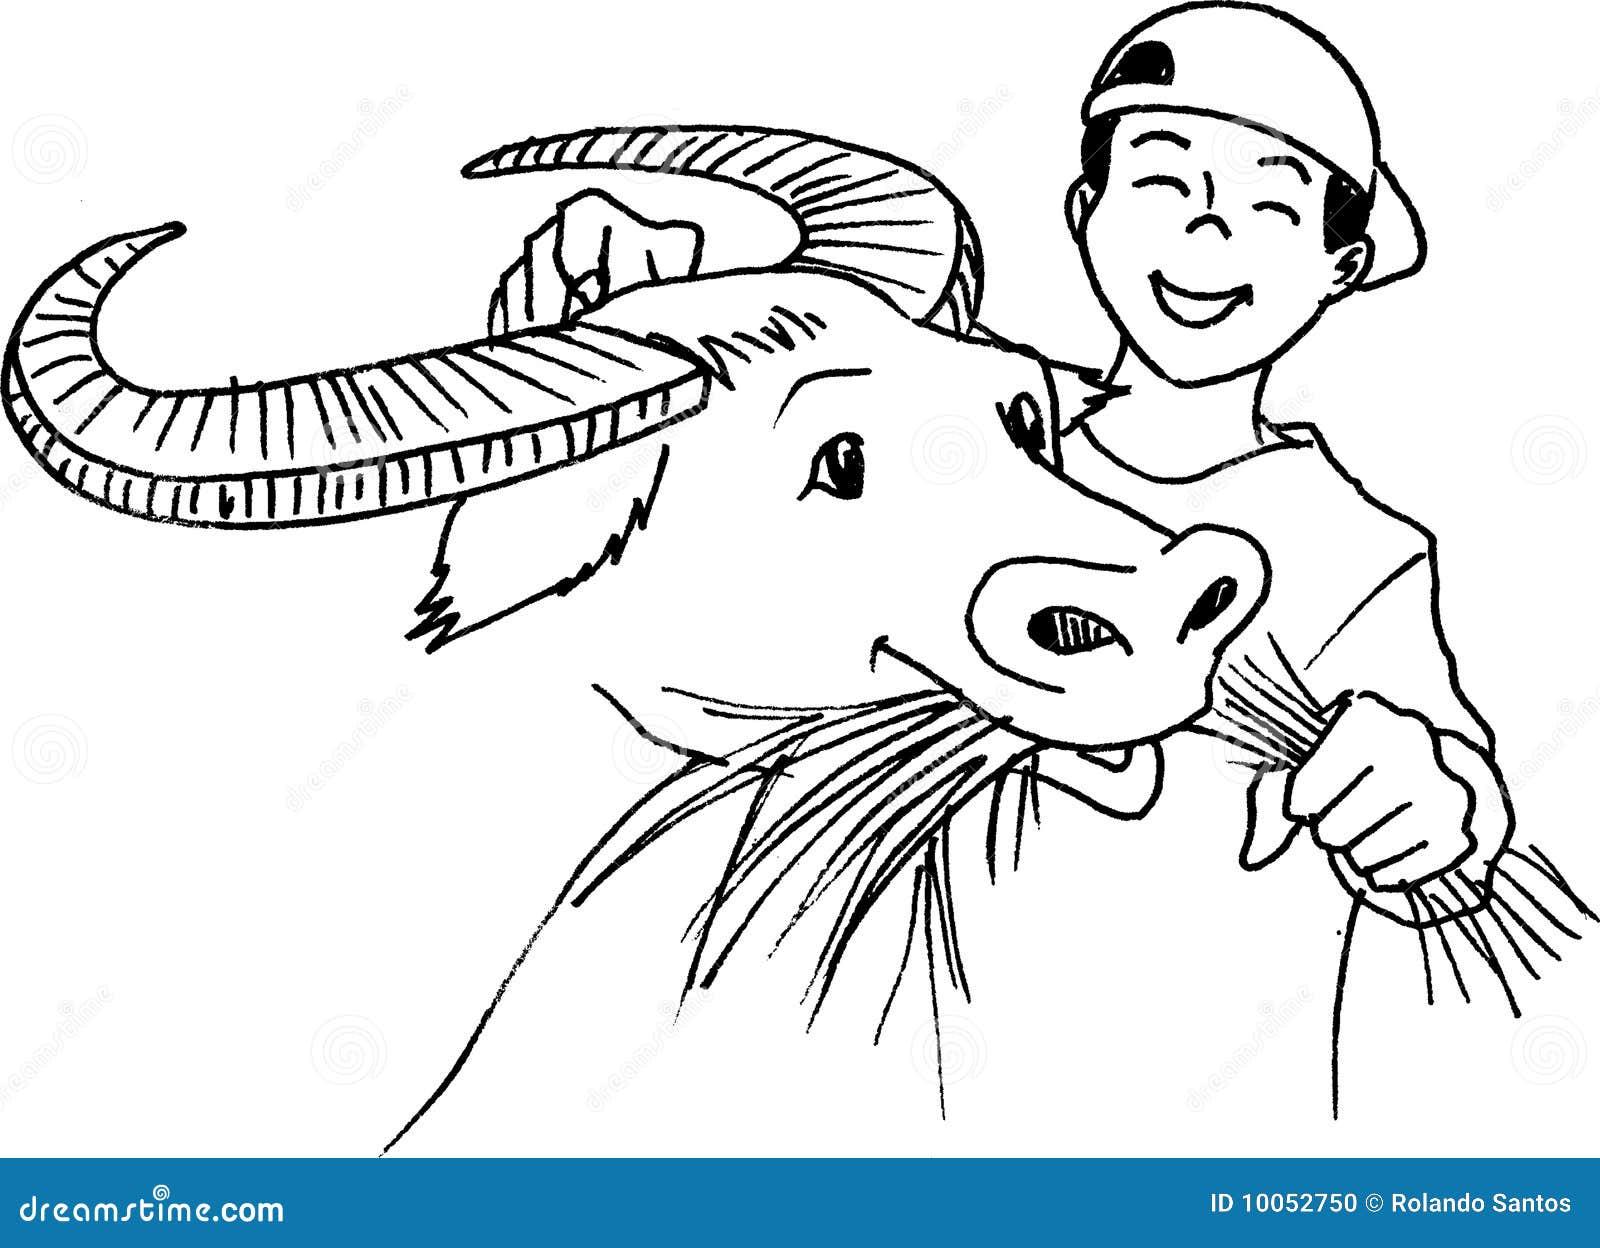 Carabao Feeding Stock Photo Image 10052750